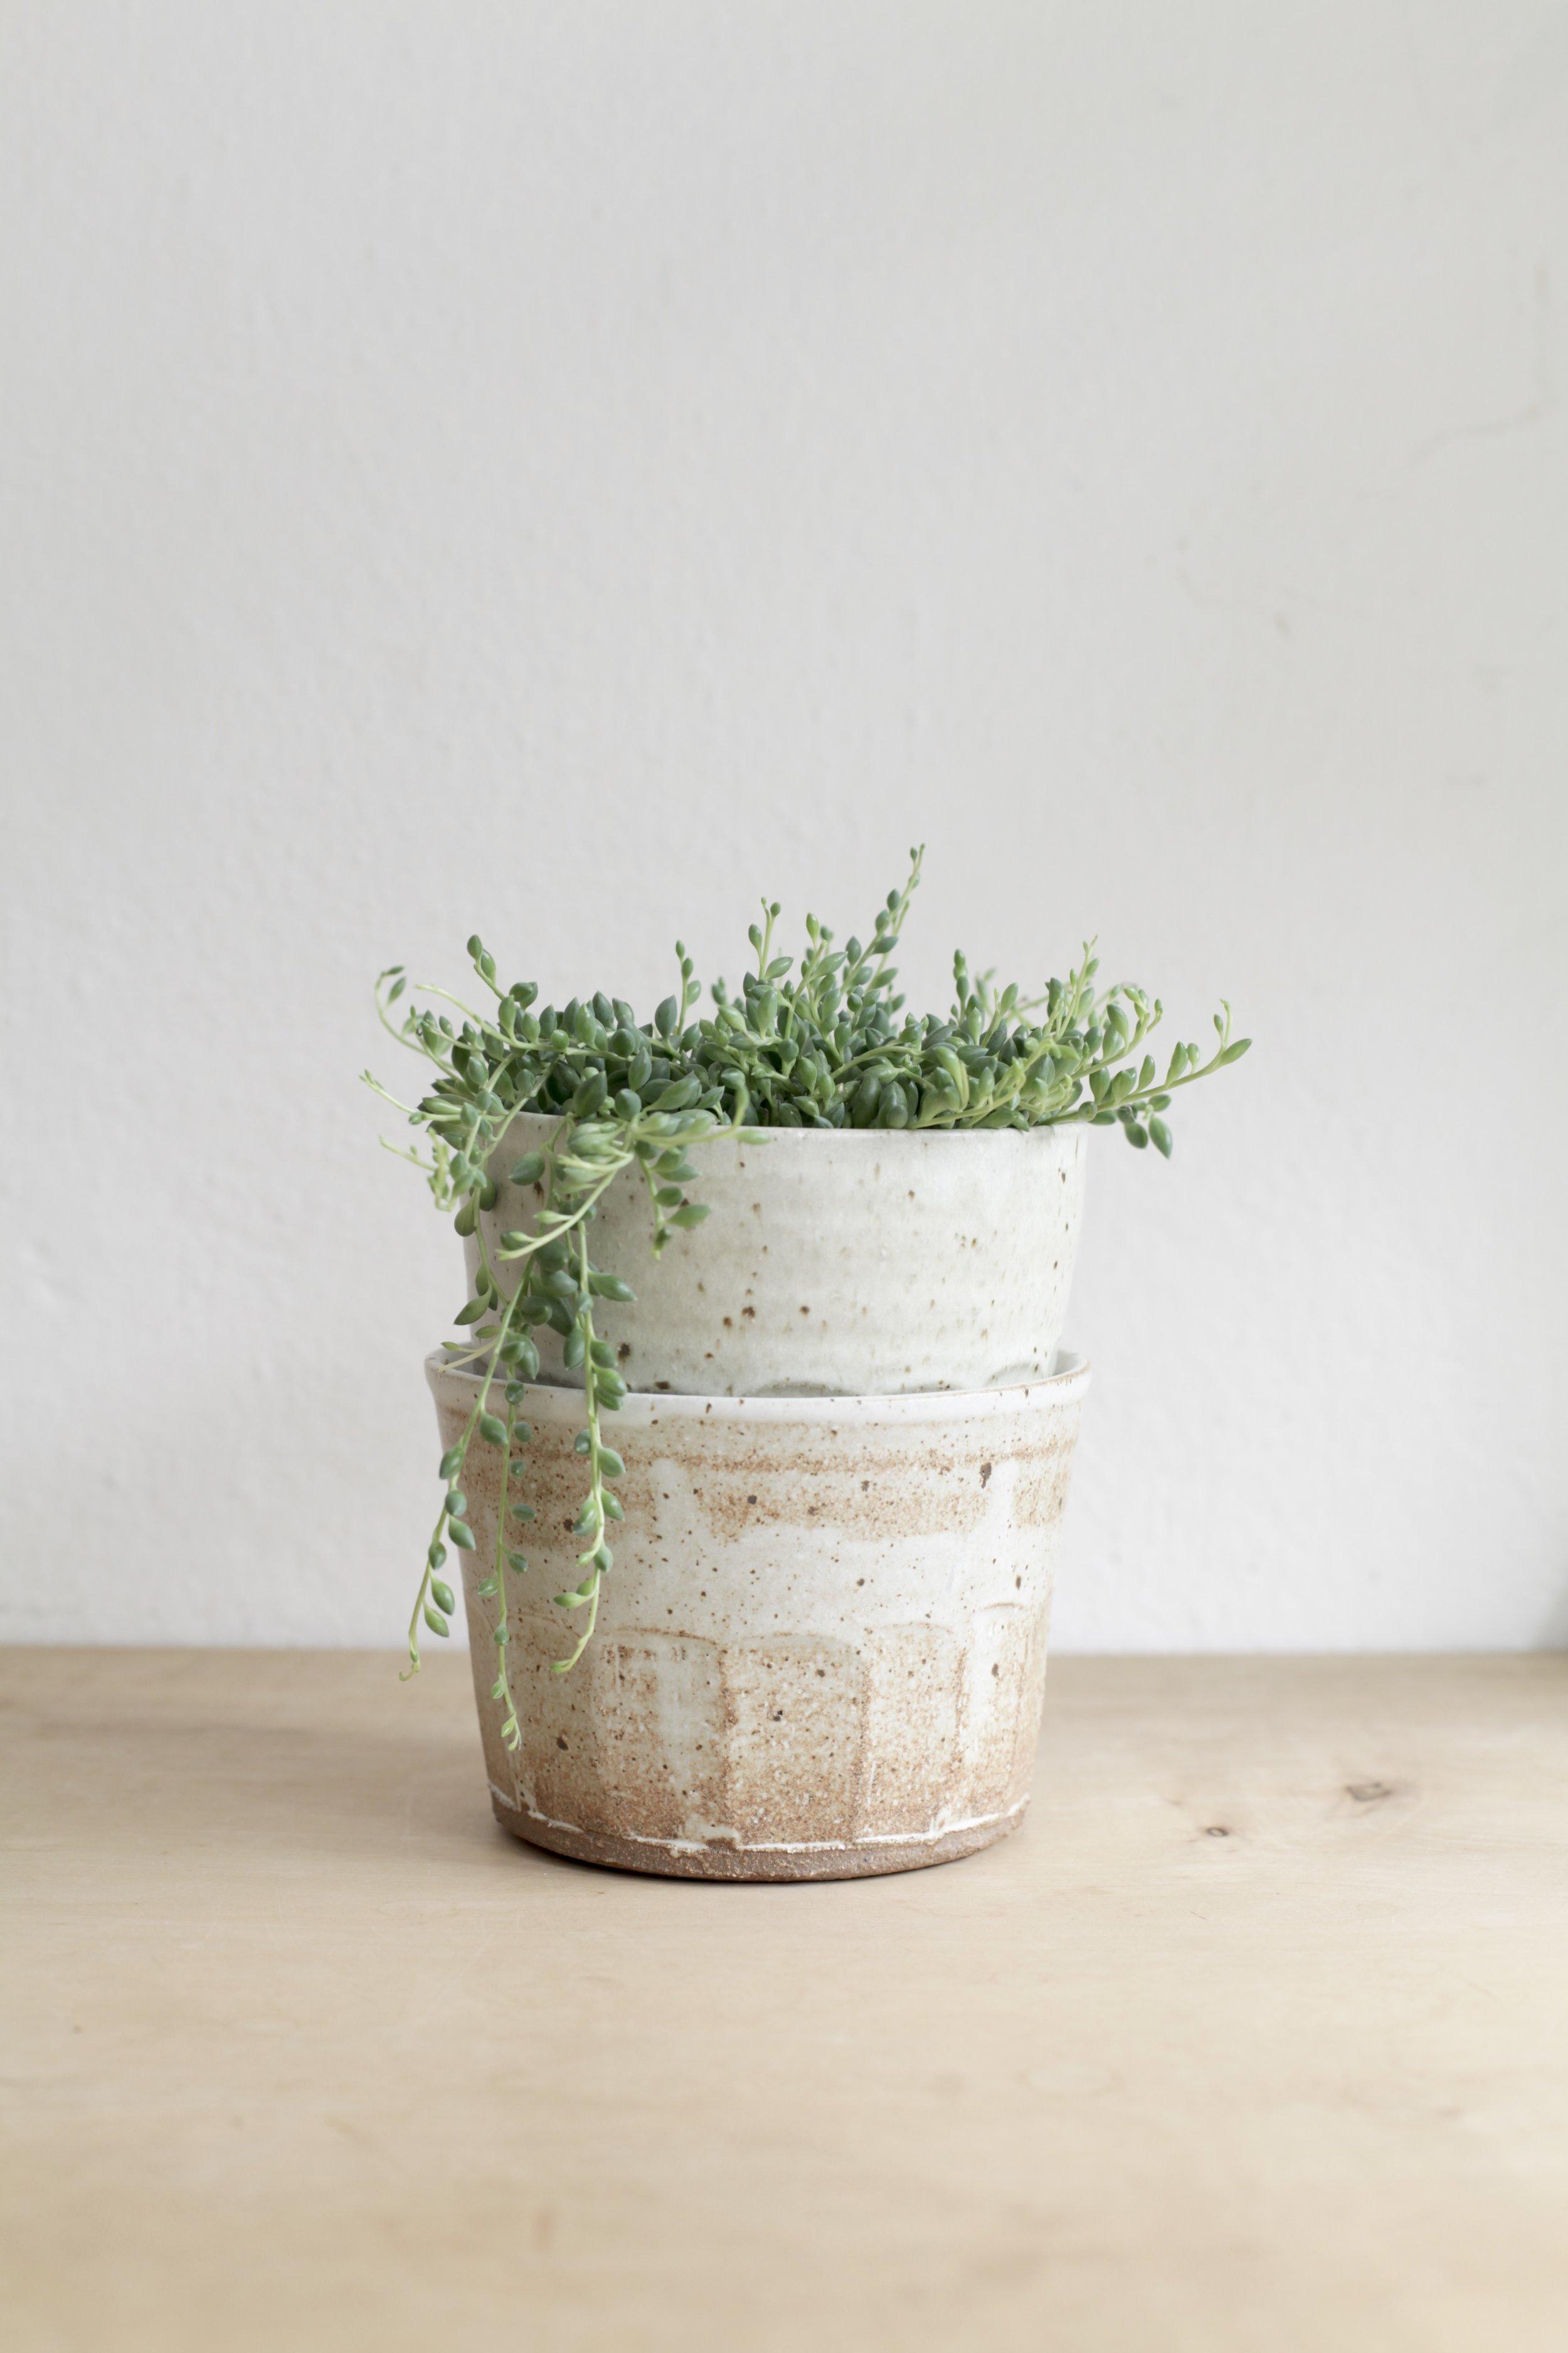 Shop - Botanical wares